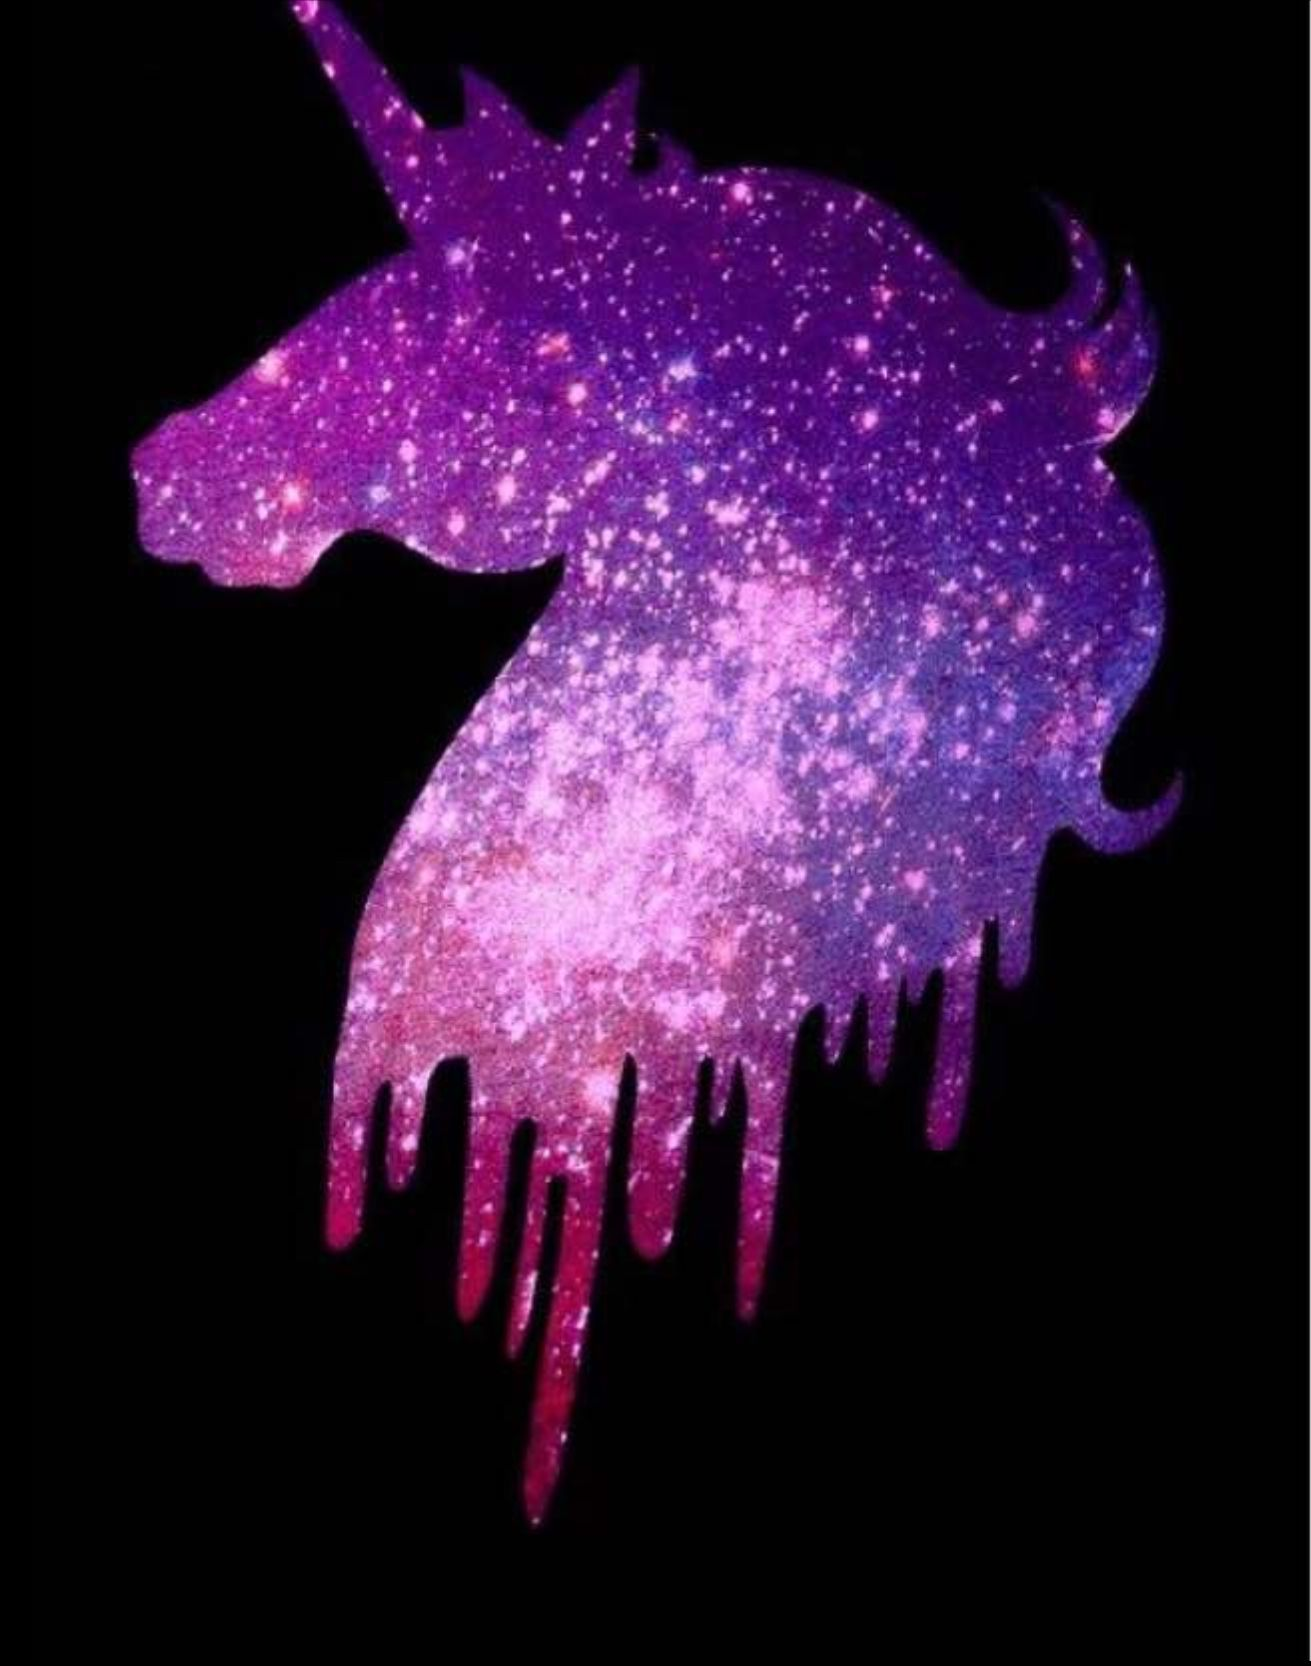 Galaxy Sparkle Glitter Rainbow Unicorn Wallpaper Novocom Top